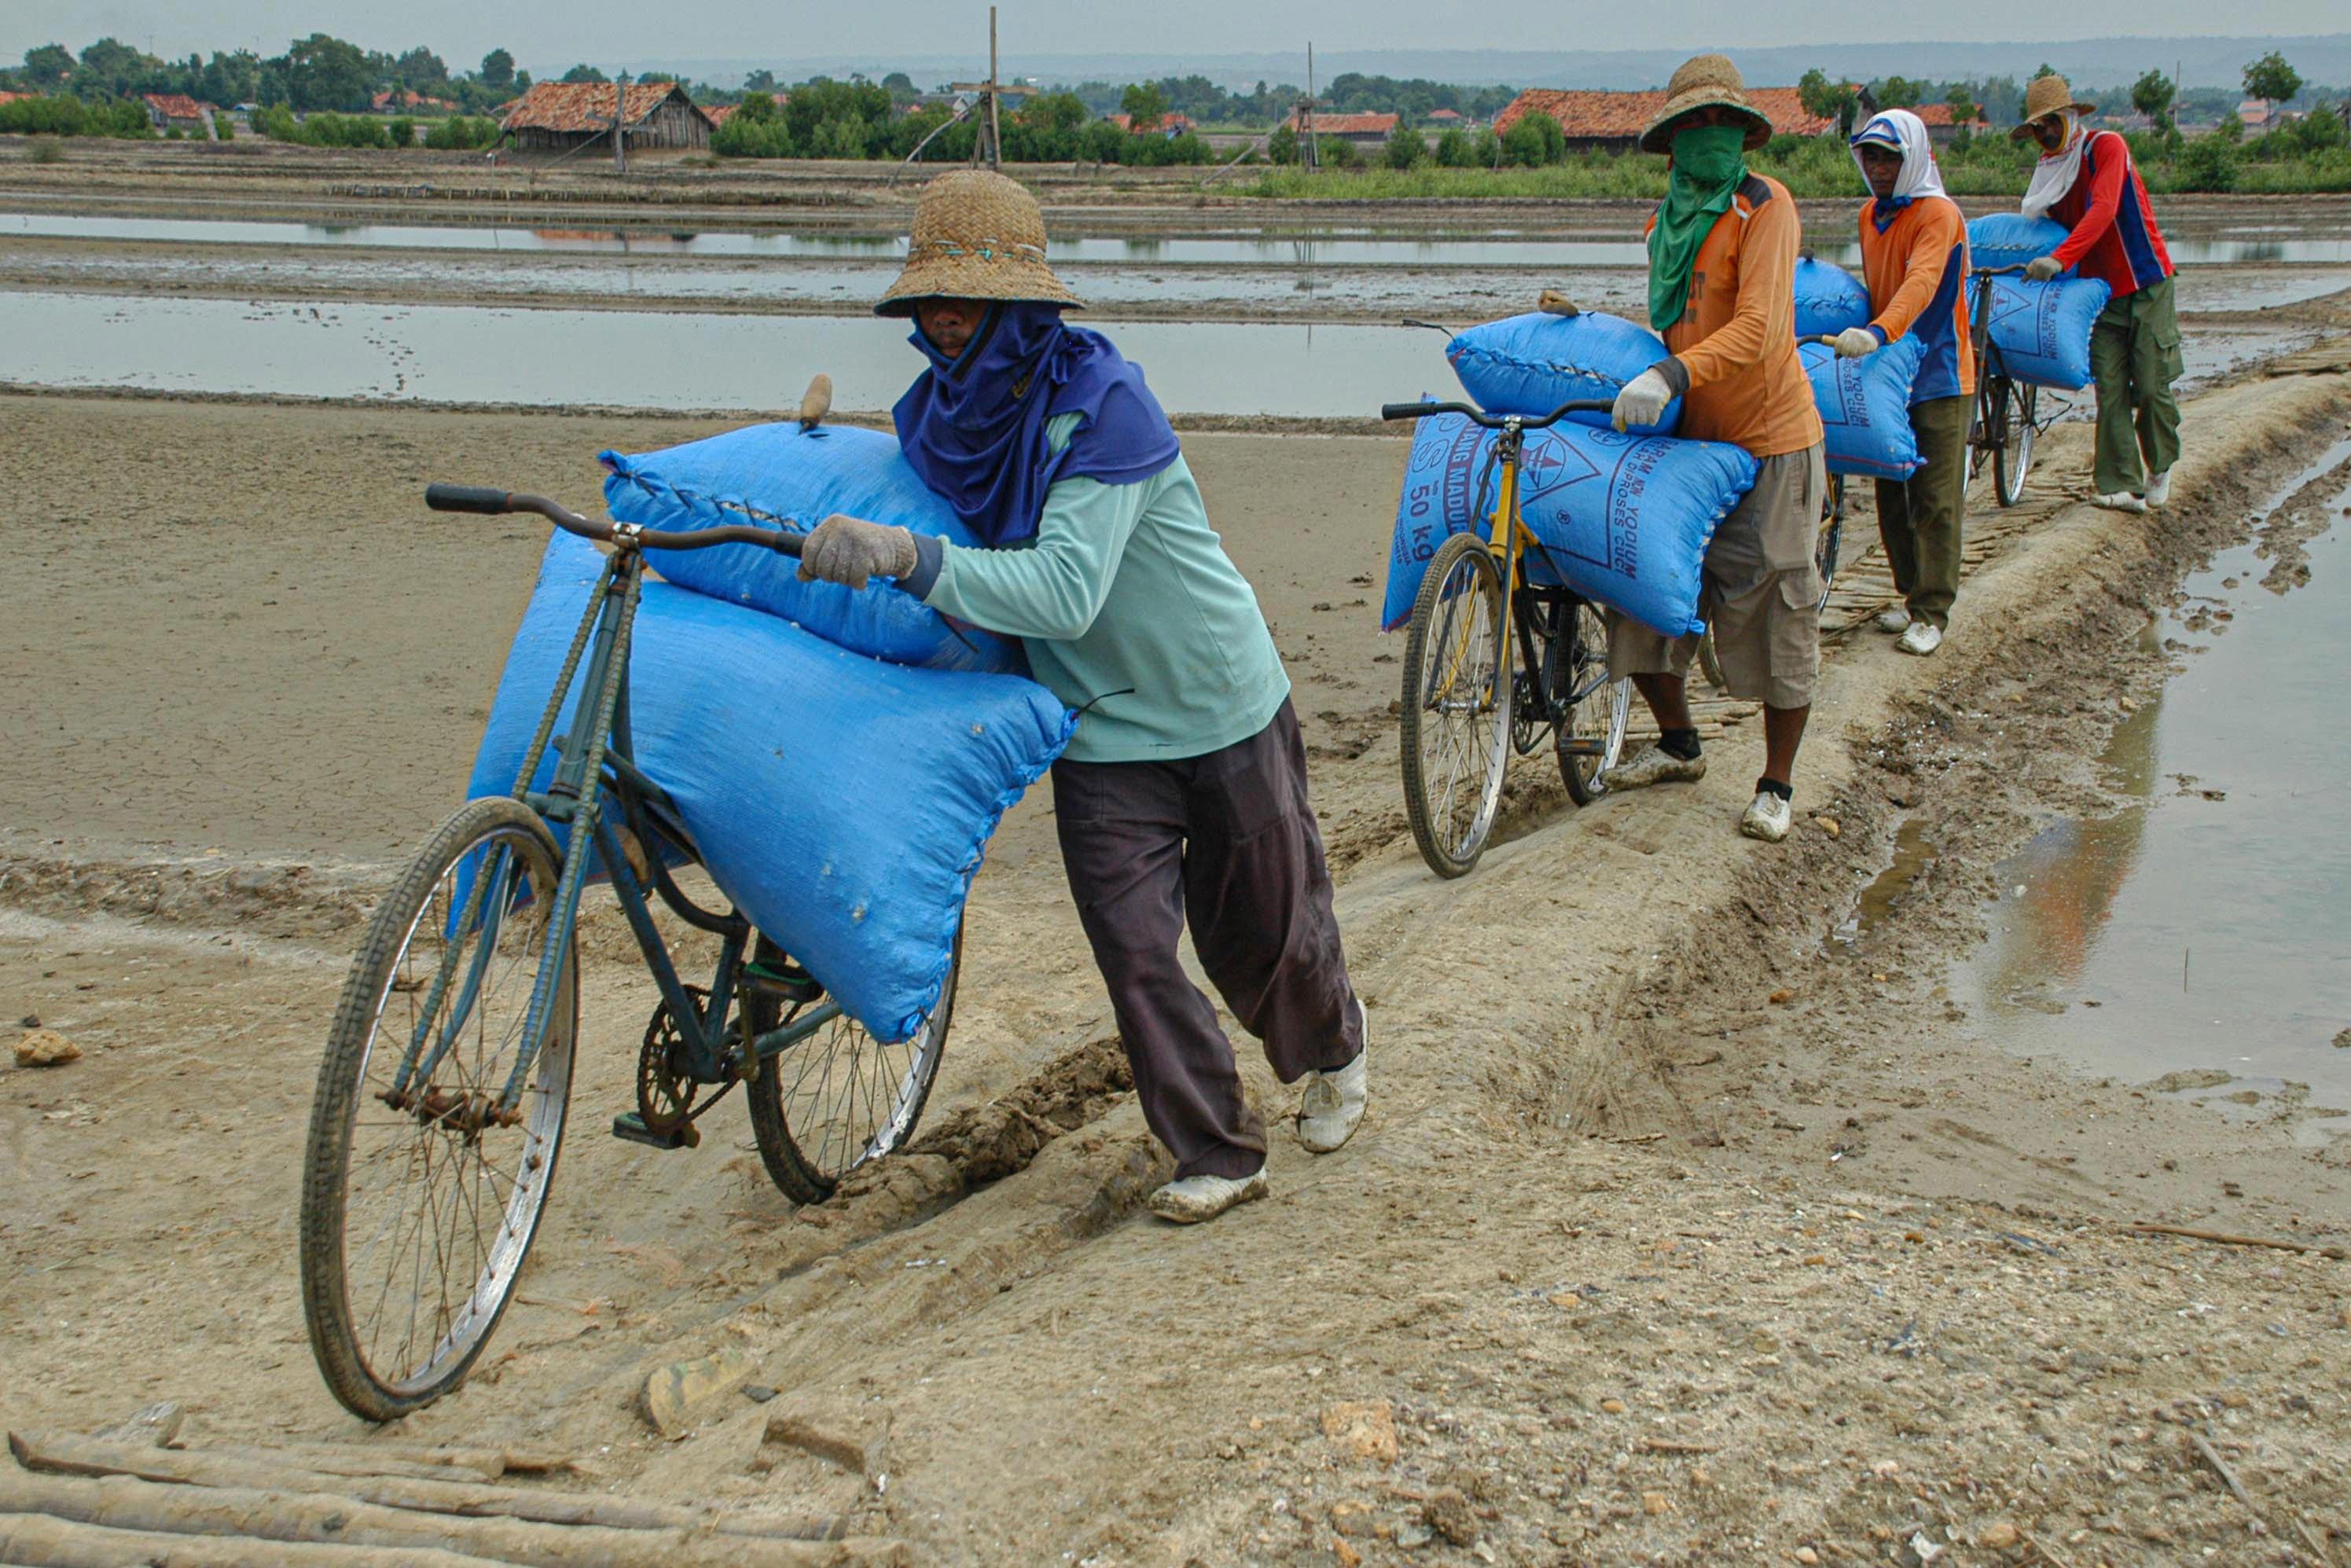 Buruh mengangkut garam untuk dipindahkan ke atas truk di Desa Bunder, Pademawu, Pamekasan, Jawa Timur.